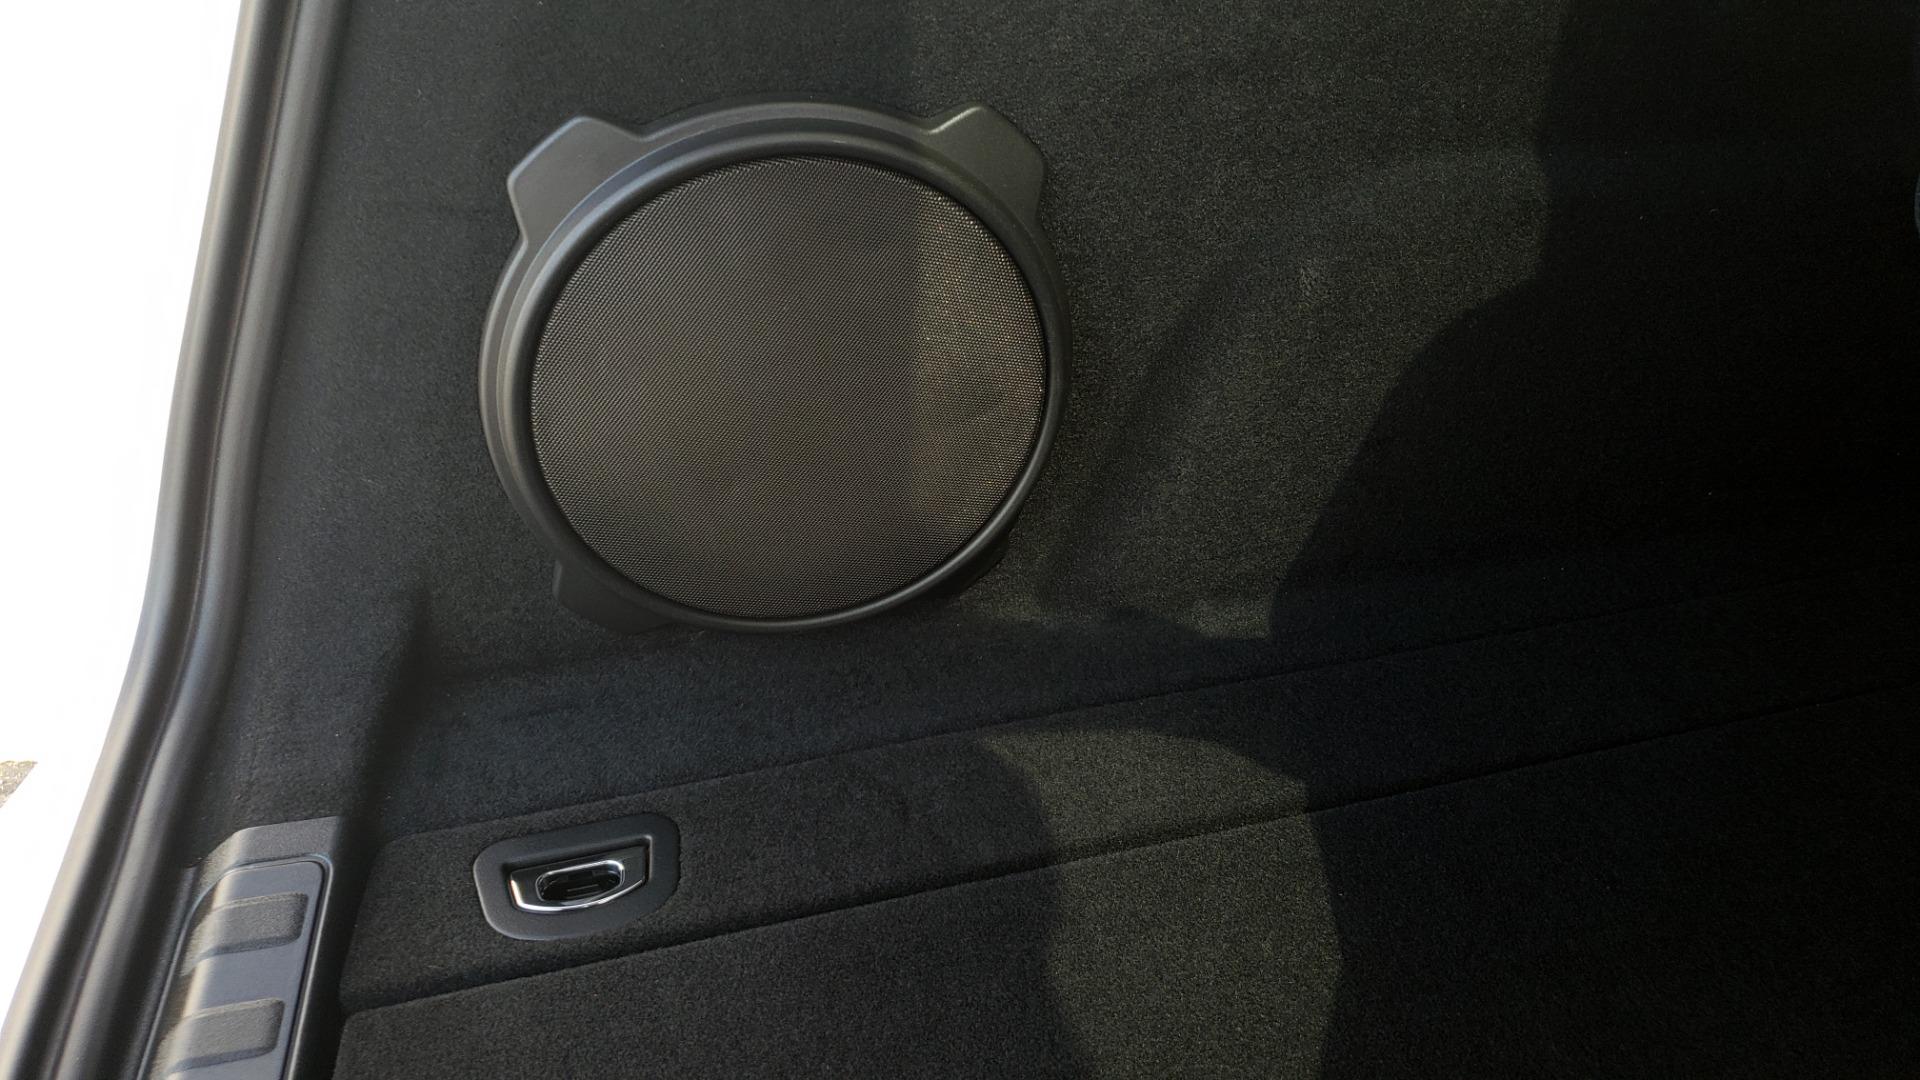 Used 2019 Alfa Romeo STELVIO TI SPORT AWD / 2.0L TURBO / 8-SPD AUTO / DRVR ASST / REARVIEW for sale $37,495 at Formula Imports in Charlotte NC 28227 21